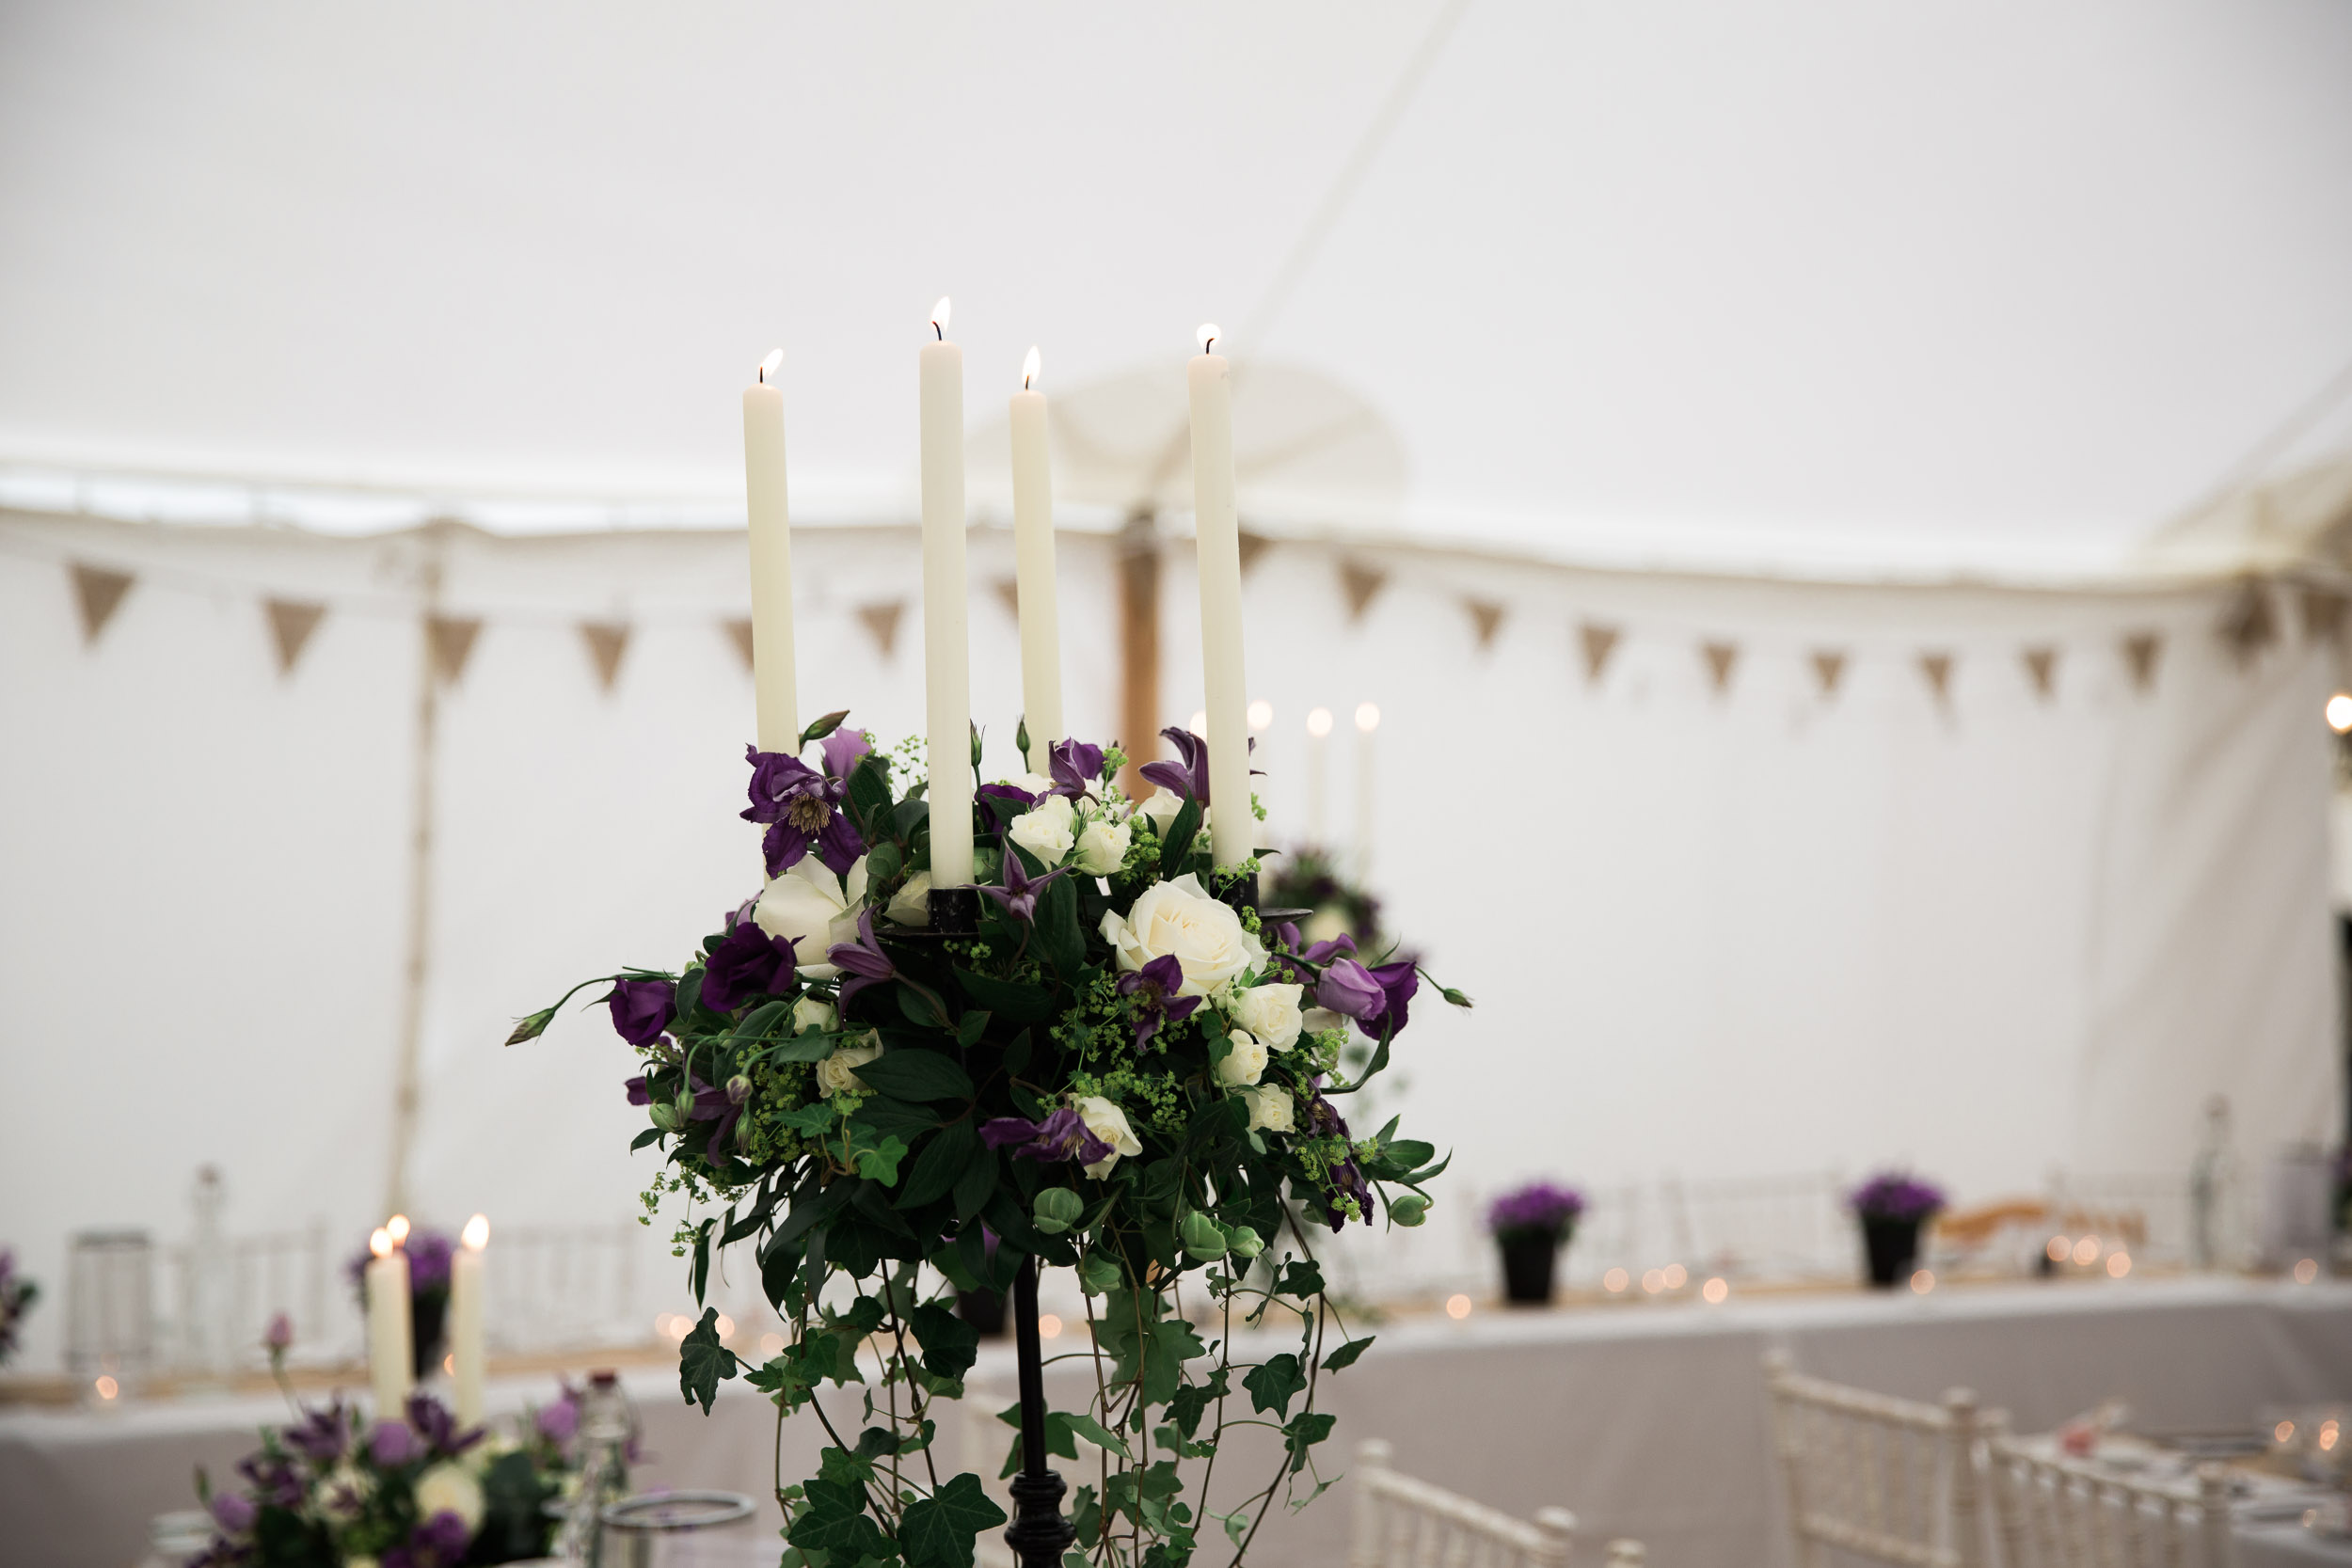 purple and white flowers candelabra wedding decor